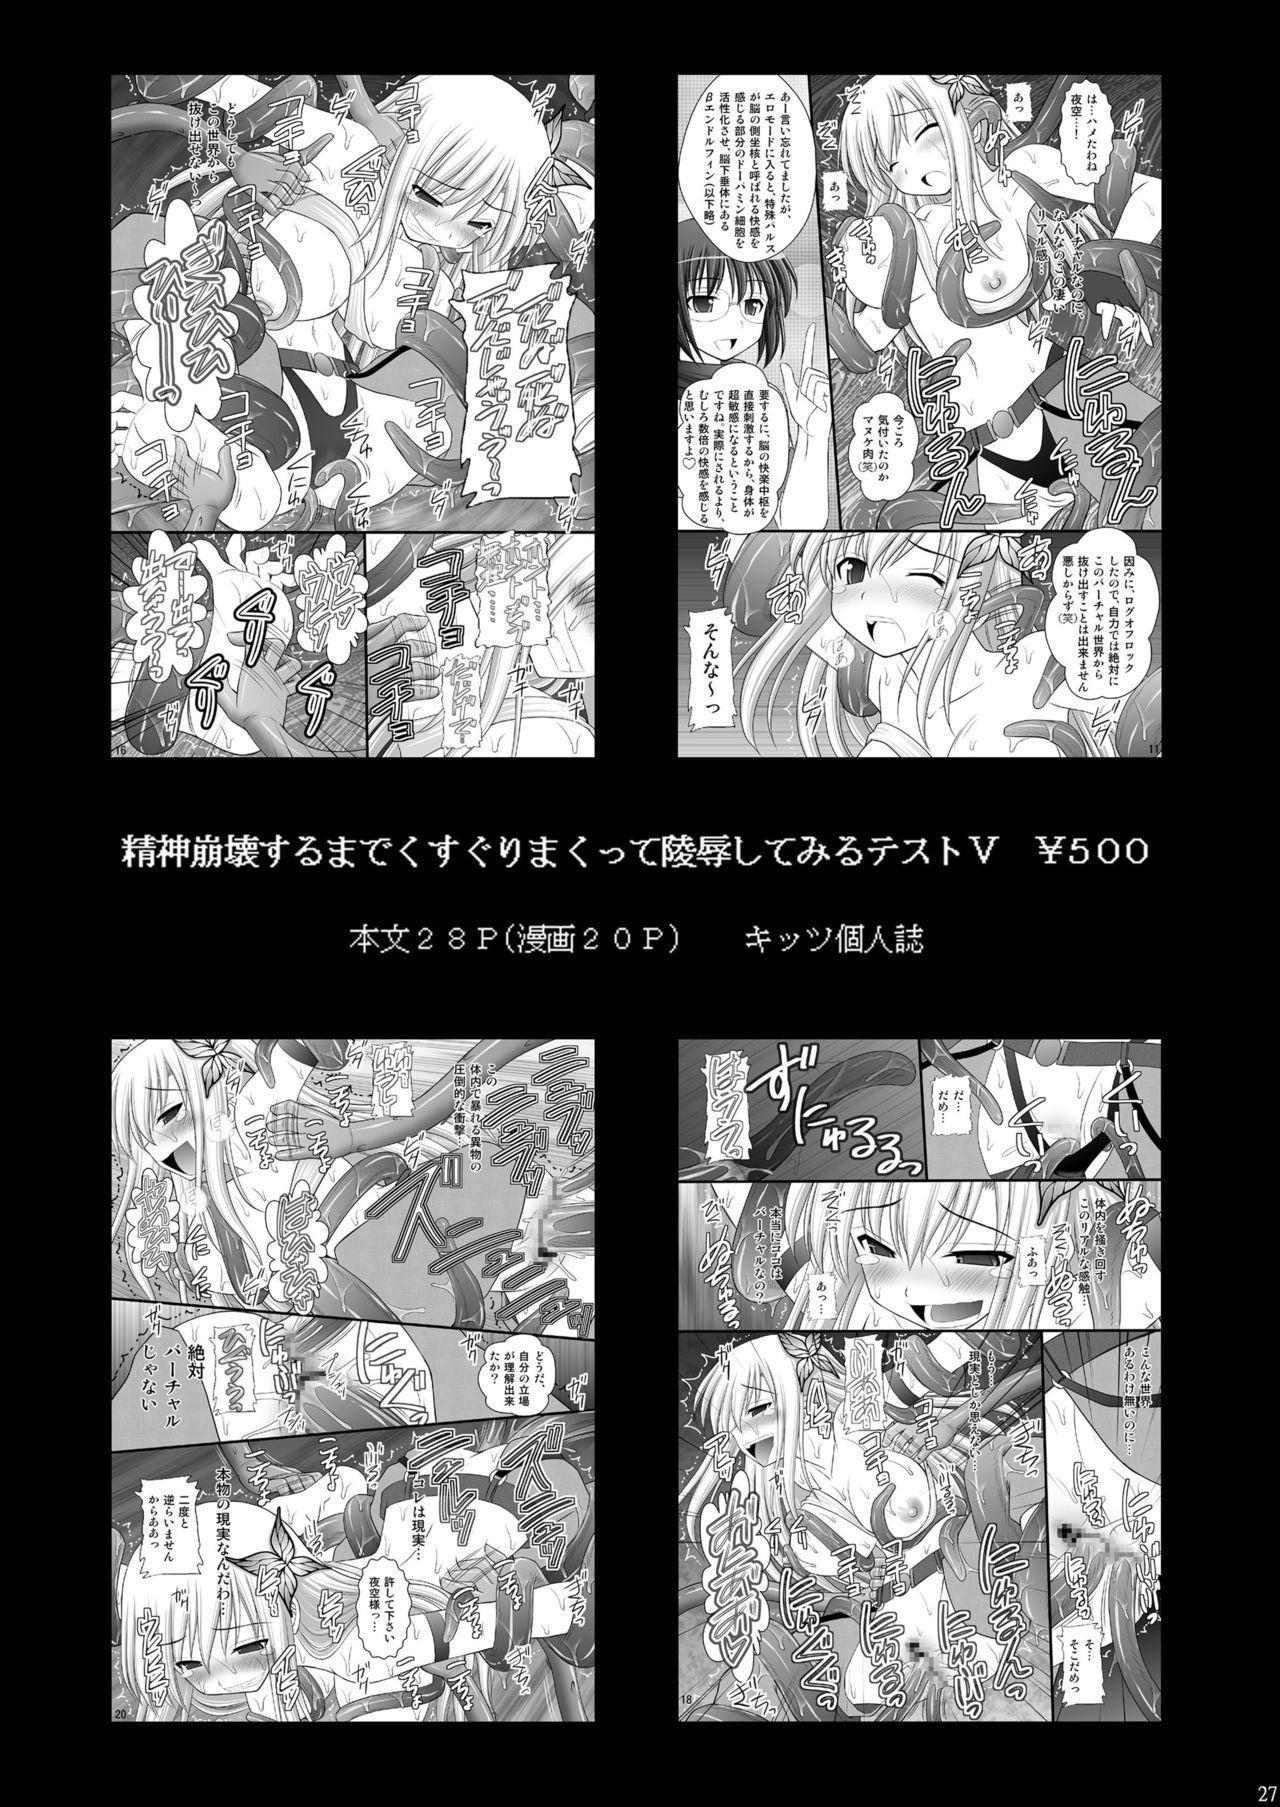 [Asanoya (Kittsu)] Toraware Hime III - Asuna Nakadashi 100-nin Dekiru ka na   Hostage Princess III (Sword Art Online) [English] [HypnoMangaEditor] [Digital] 25